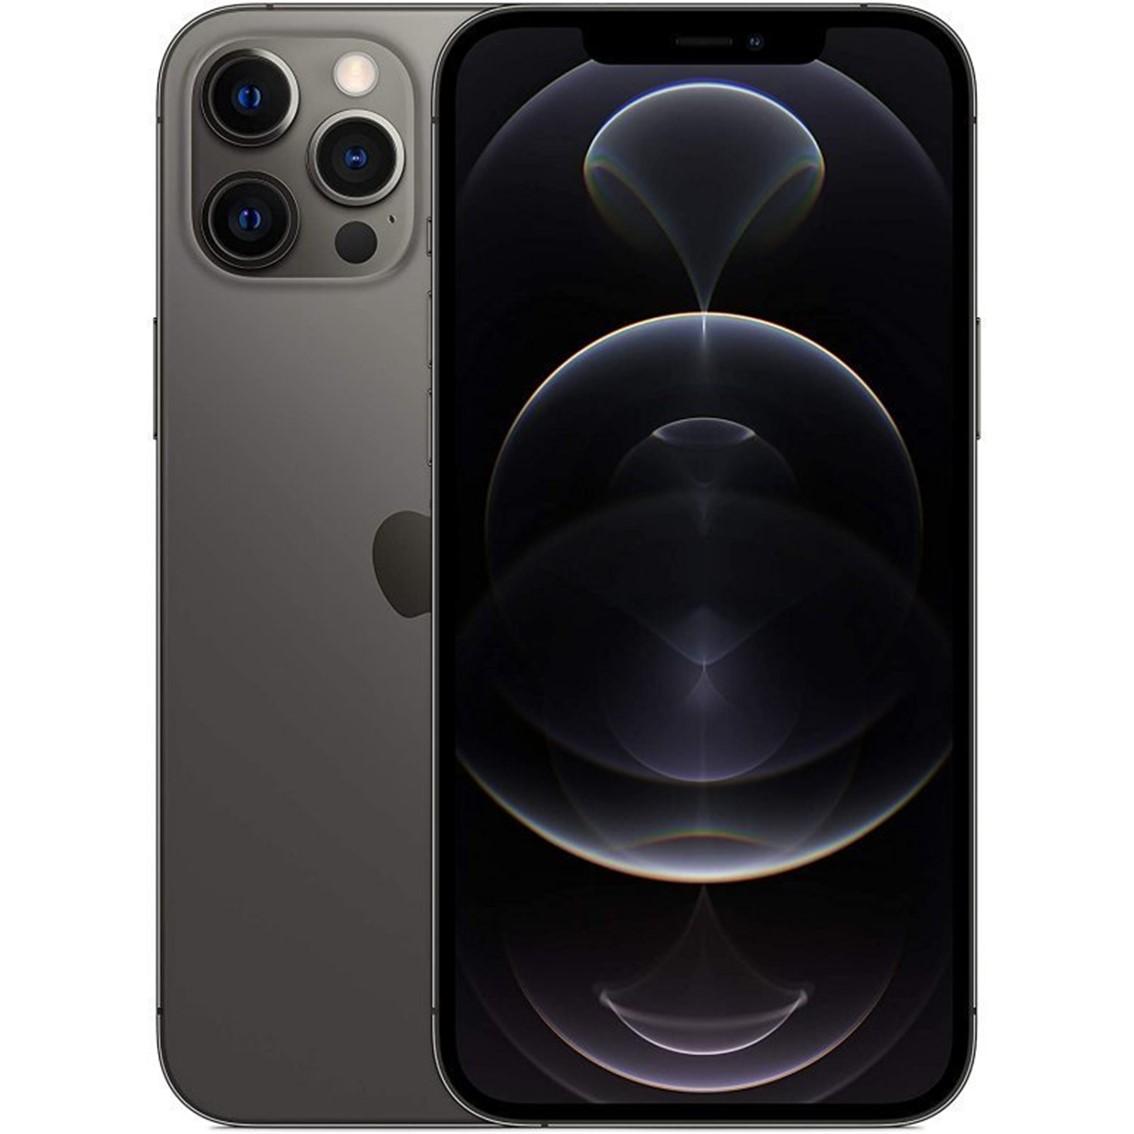 Apple iphone 12 pro max 128gb graphite sin cargador - sin auriculares - a14 bionic - 12mpx - 6.7  mgd73ql - a